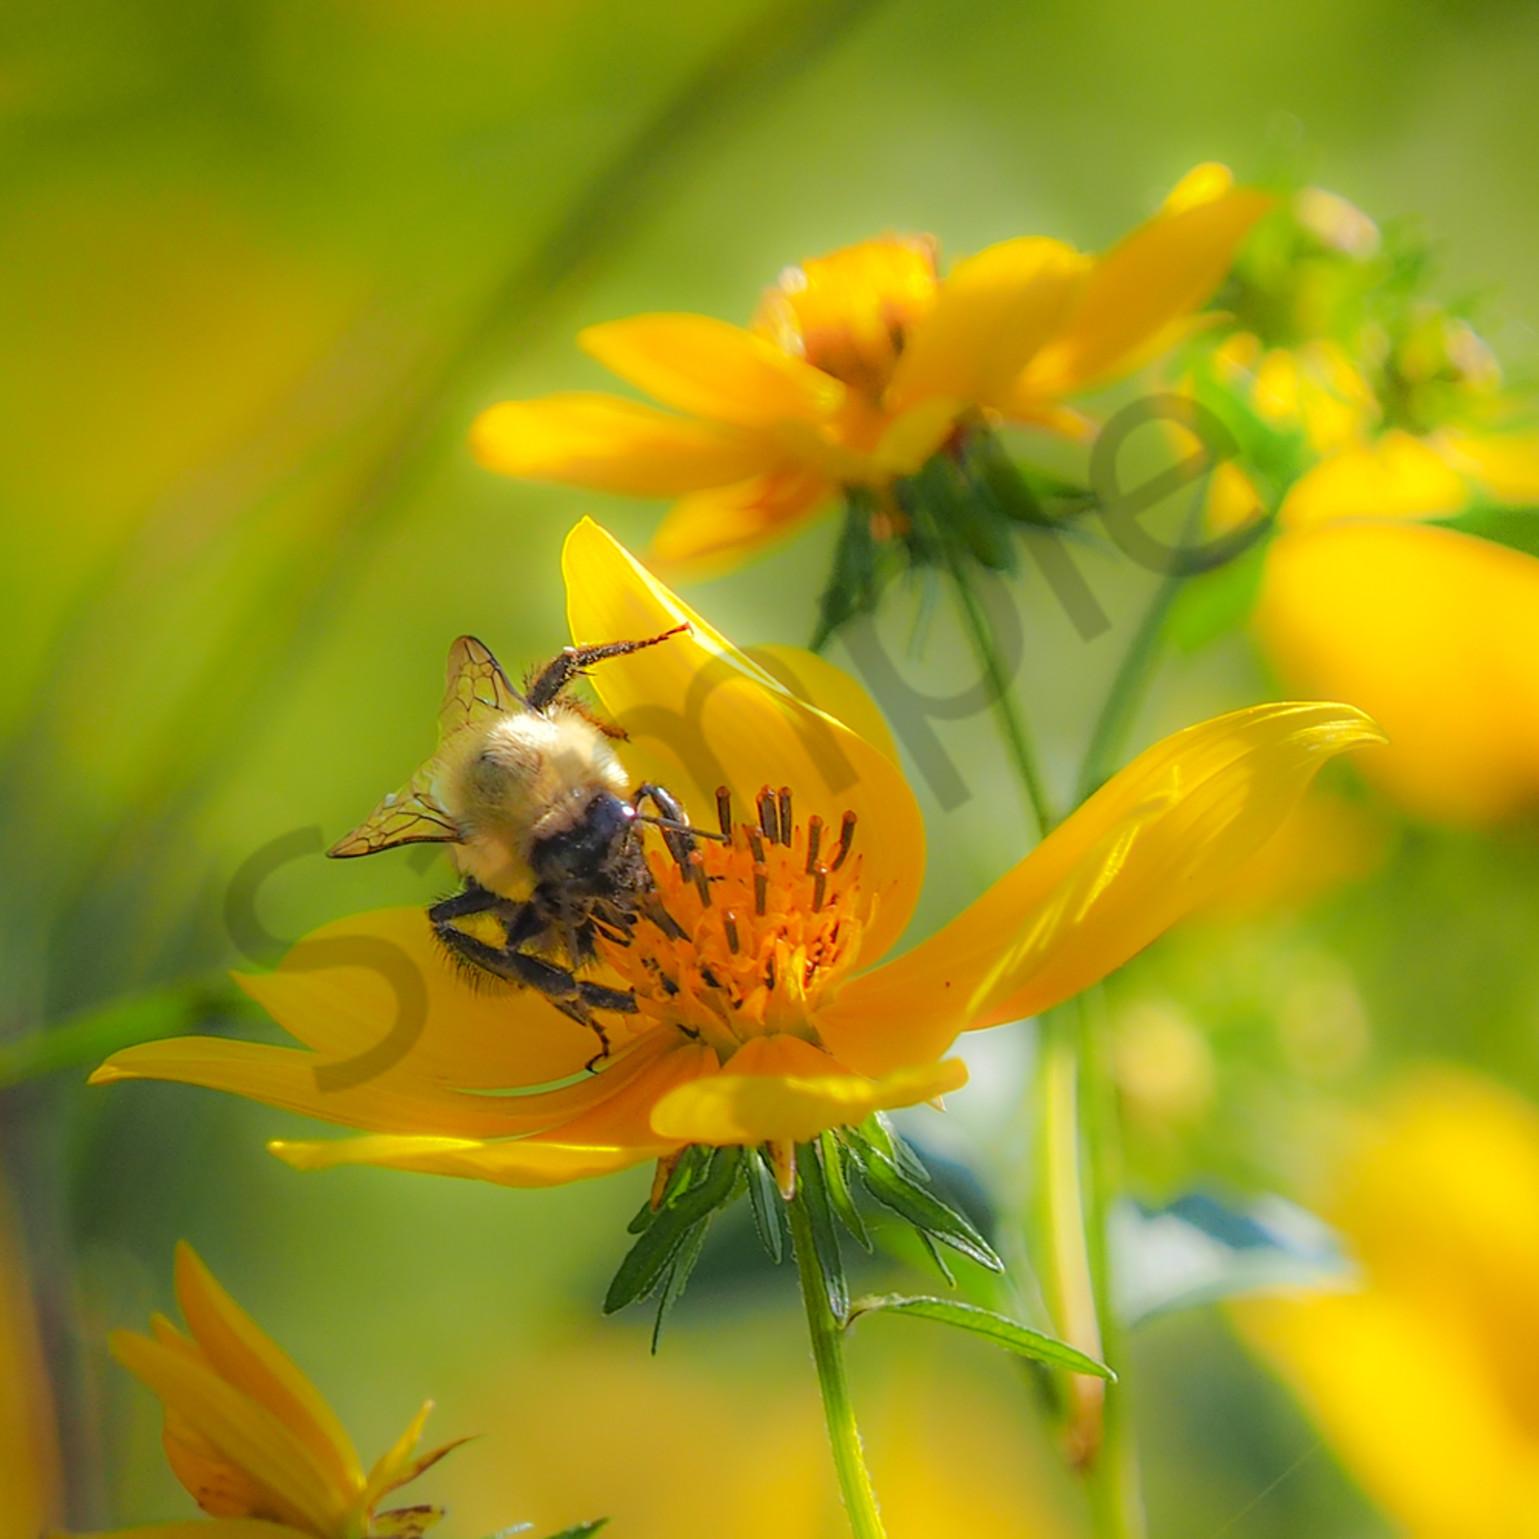 Bee nectar dbc9r3